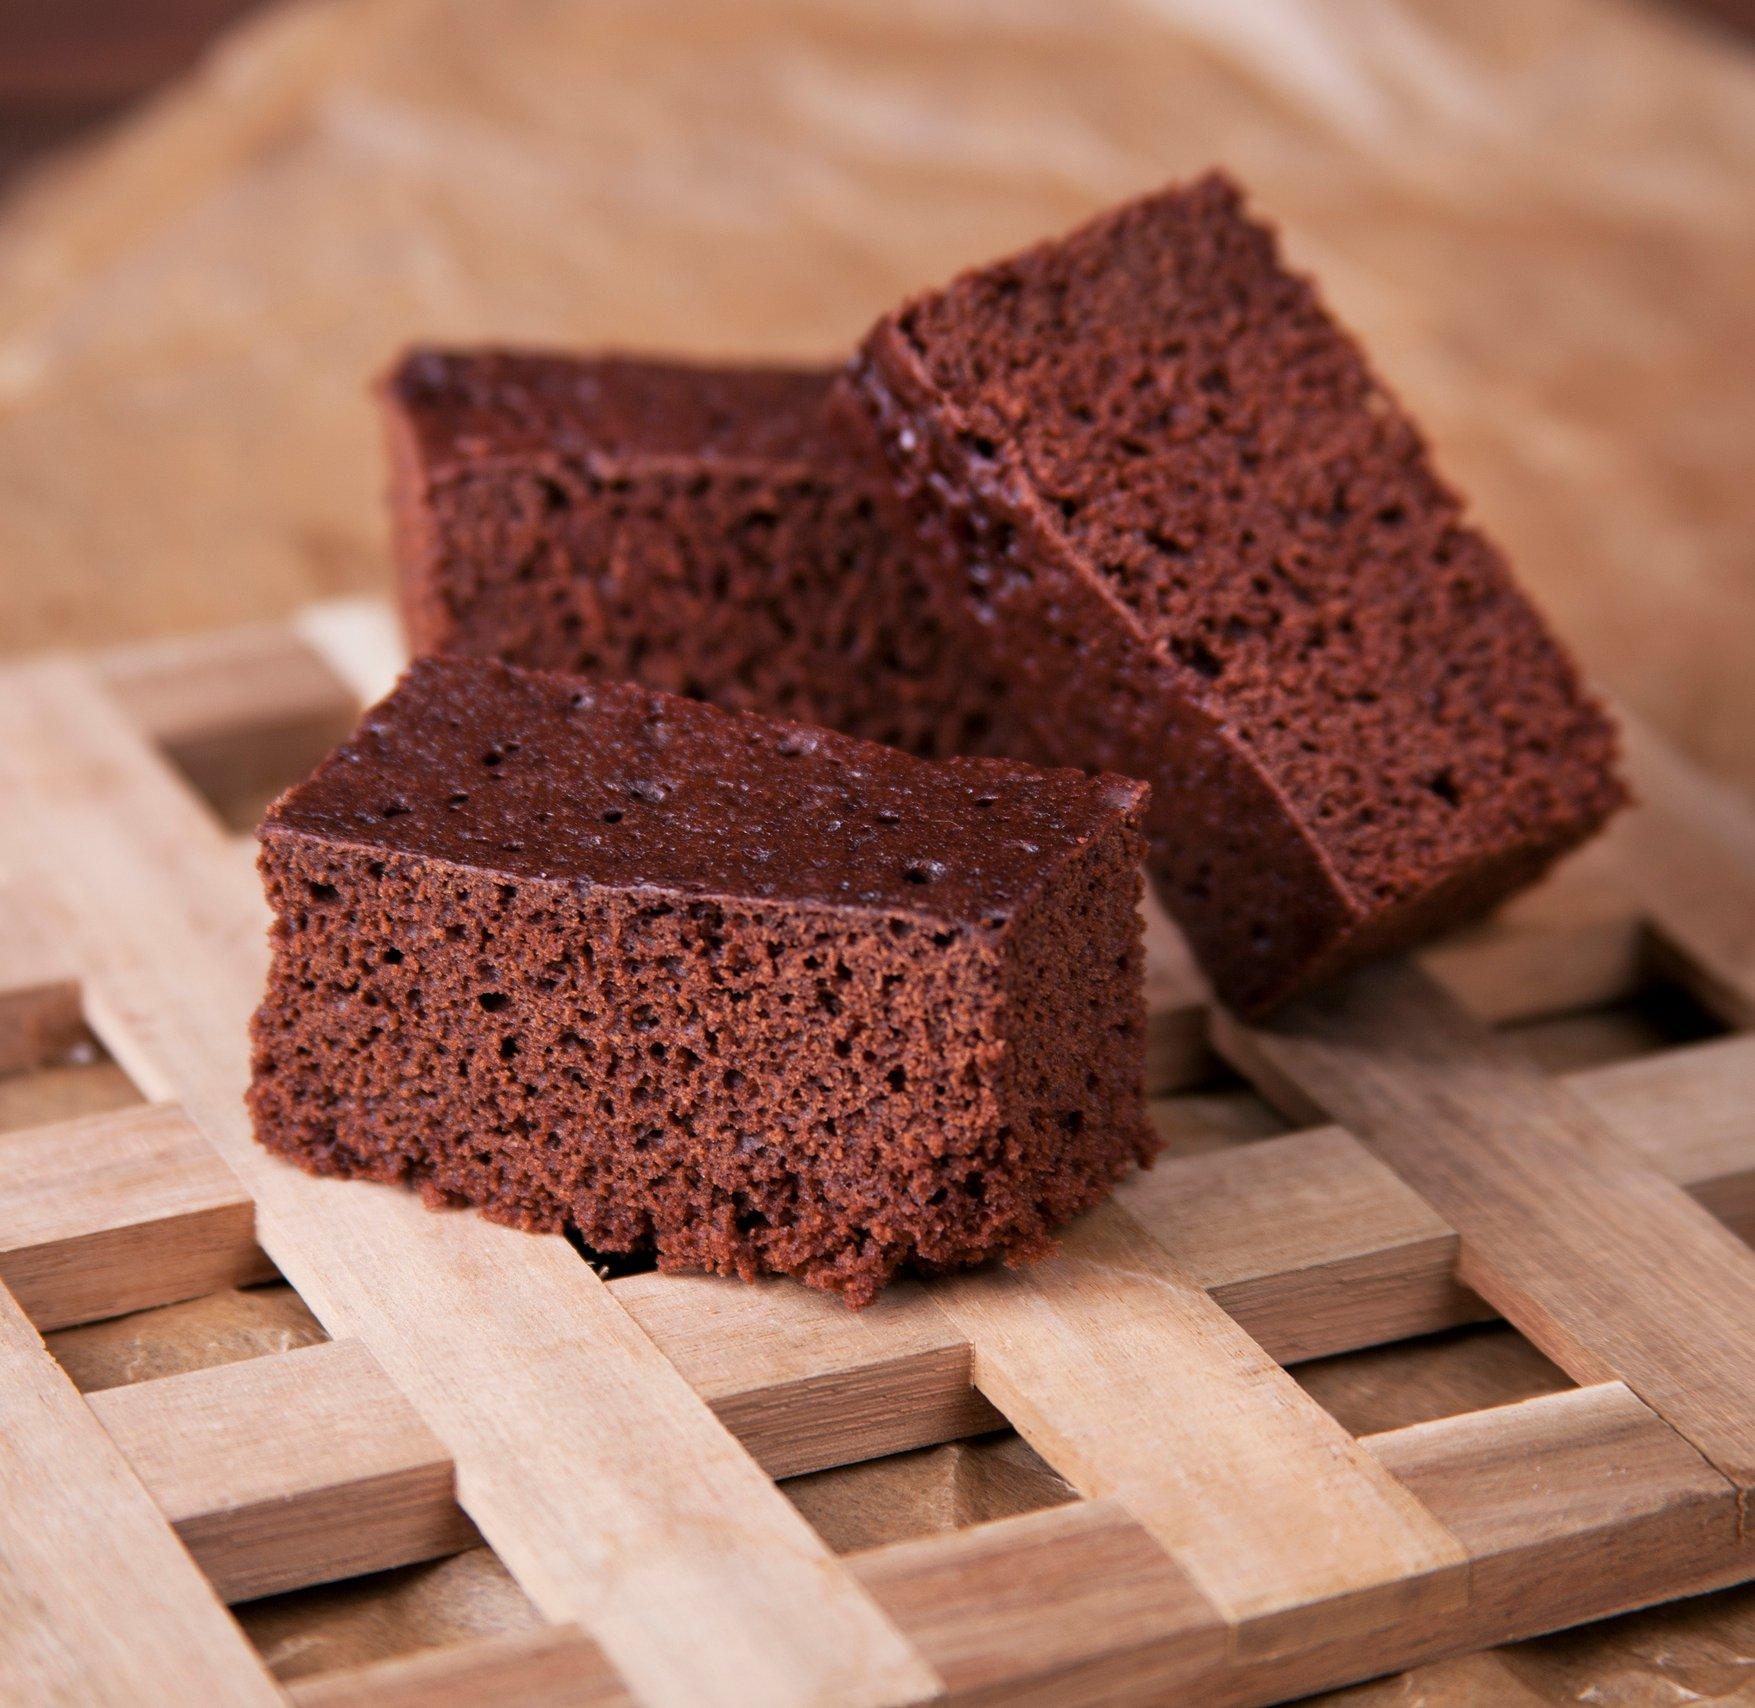 Wacky cake is moist, dark and delicious. (iStock Photo)